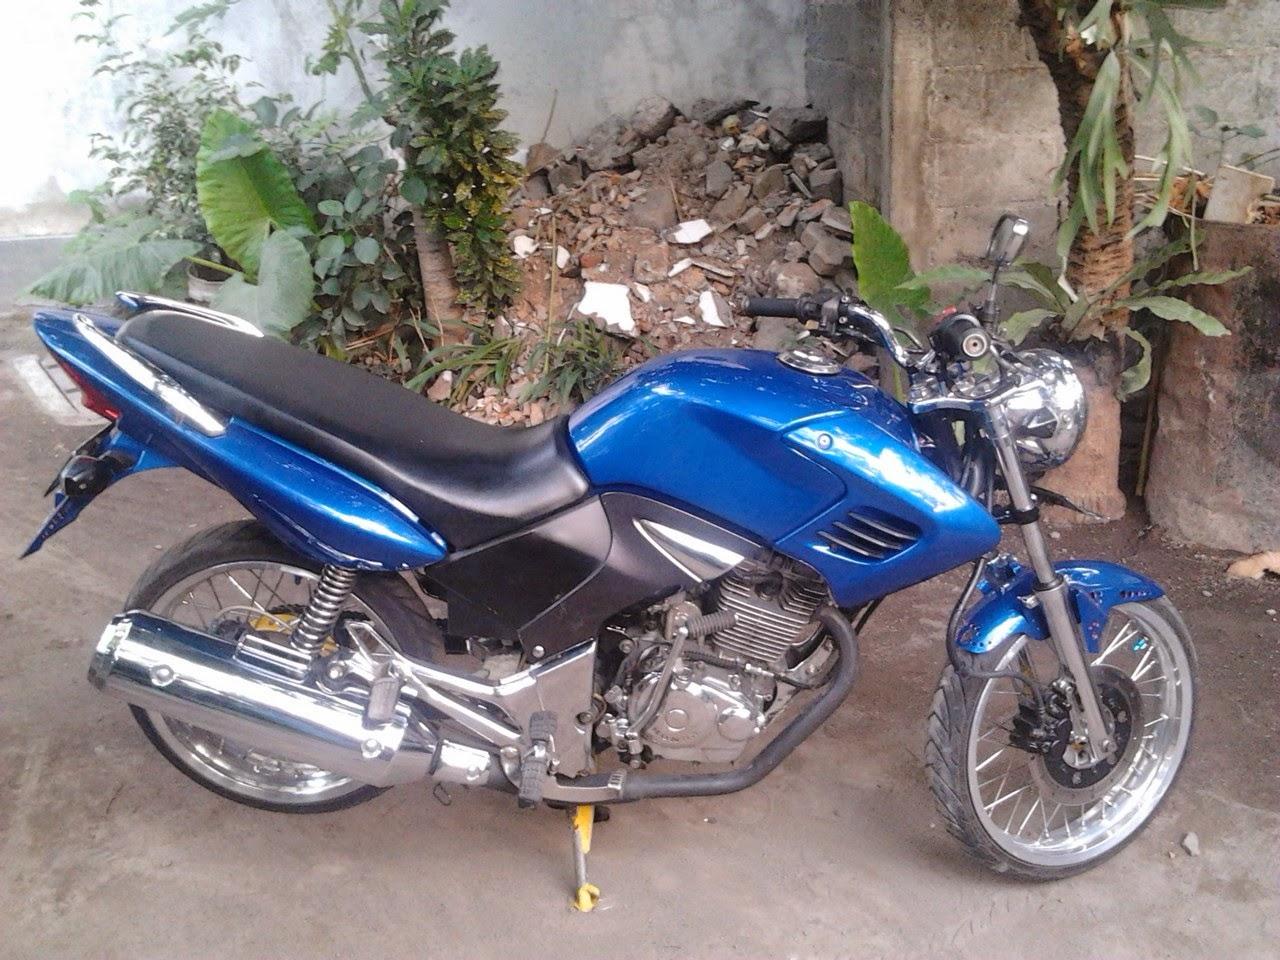 Modif Motor Honda Absolute